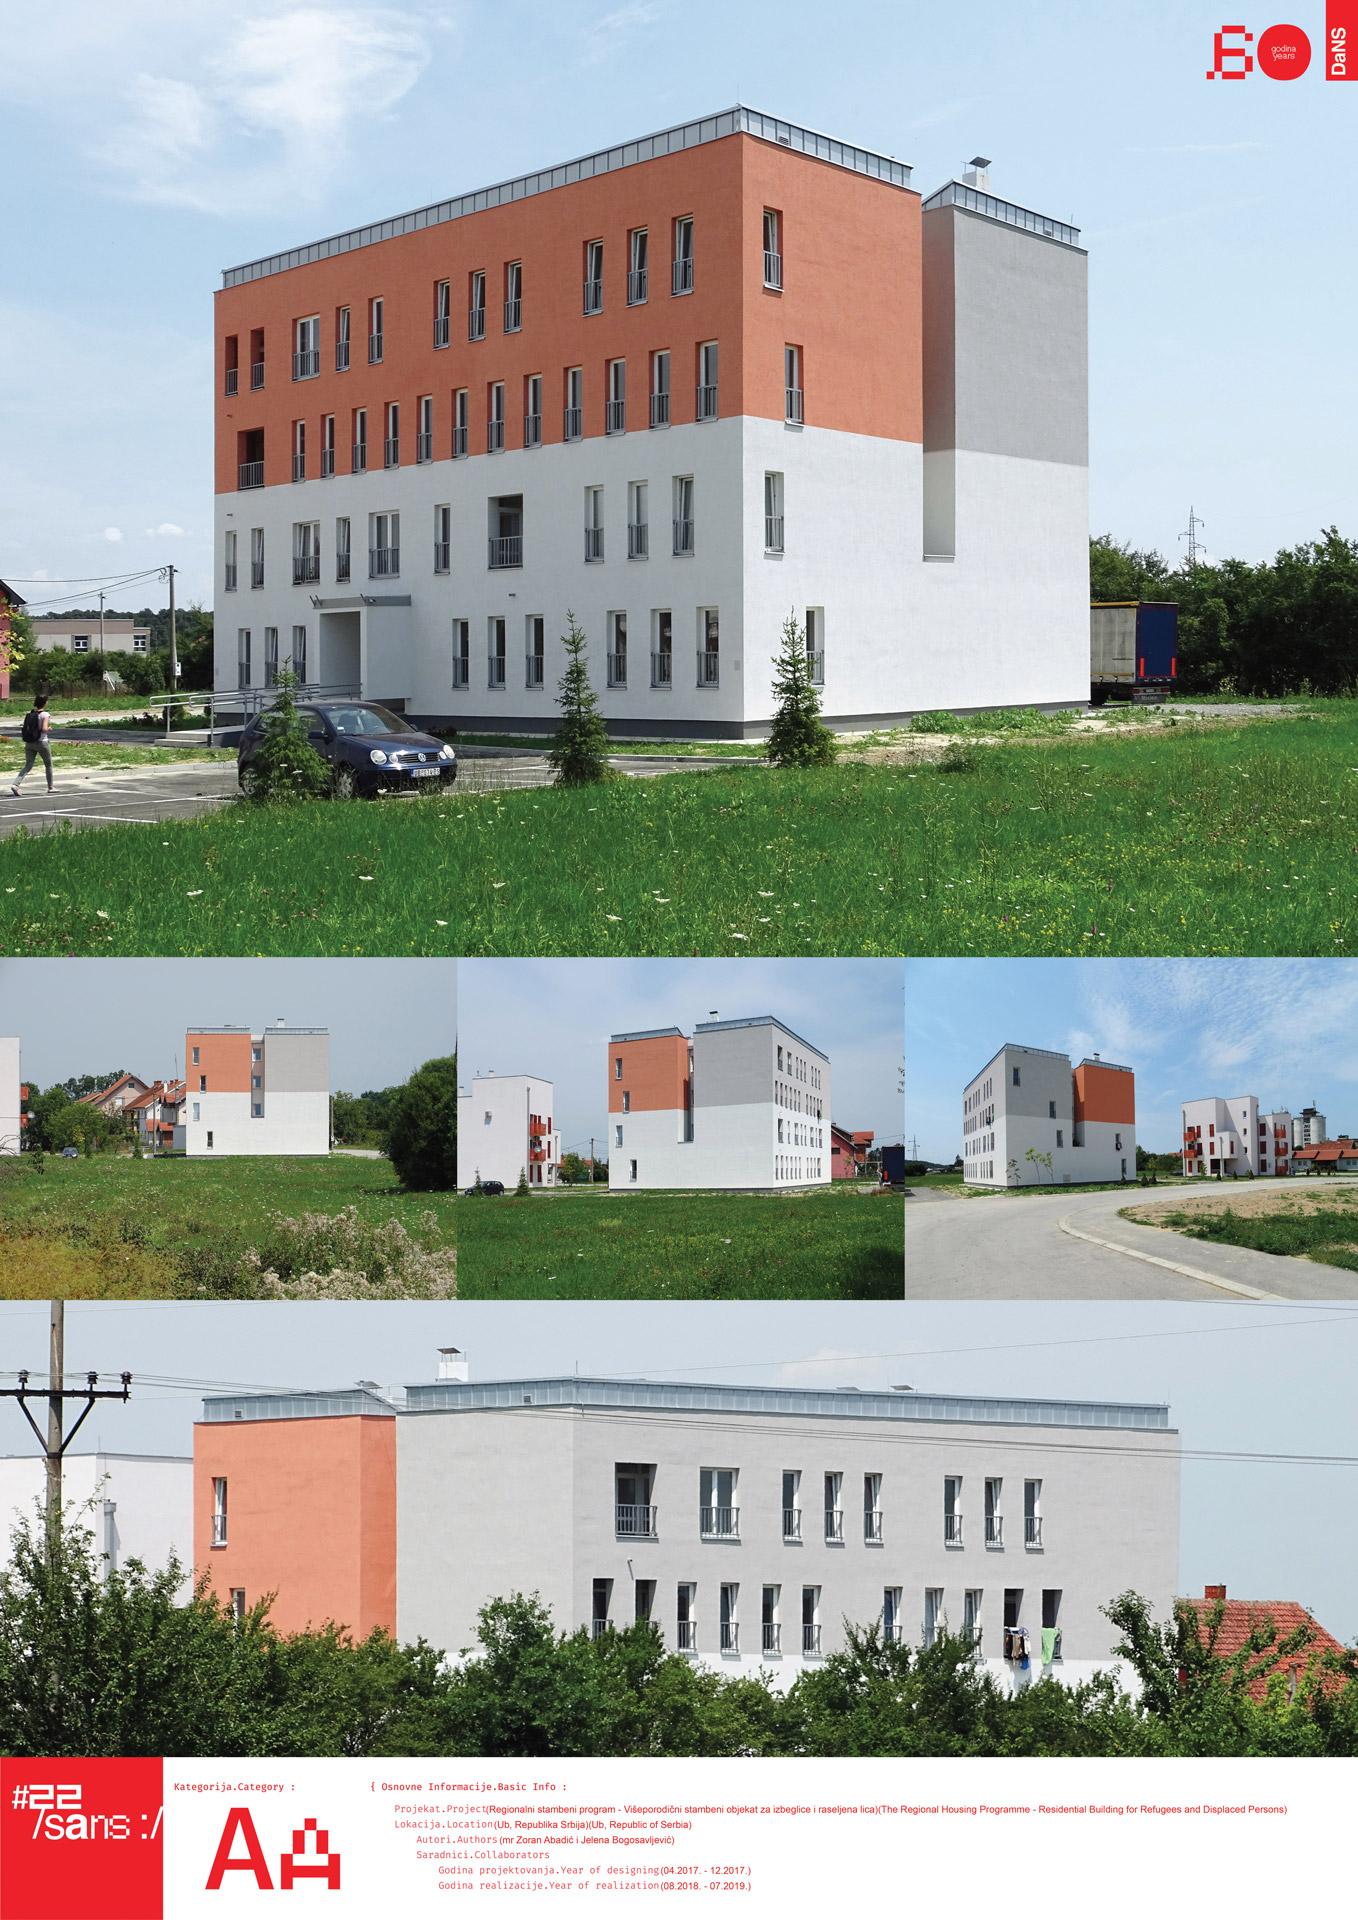 "<p class=""naslov-br"">aa11</p>Višeporodični stambeni objekat za izbeglice i raseljena lica // The Regional Housing Programme – Residental Building for Refugees and Displaced Persons"